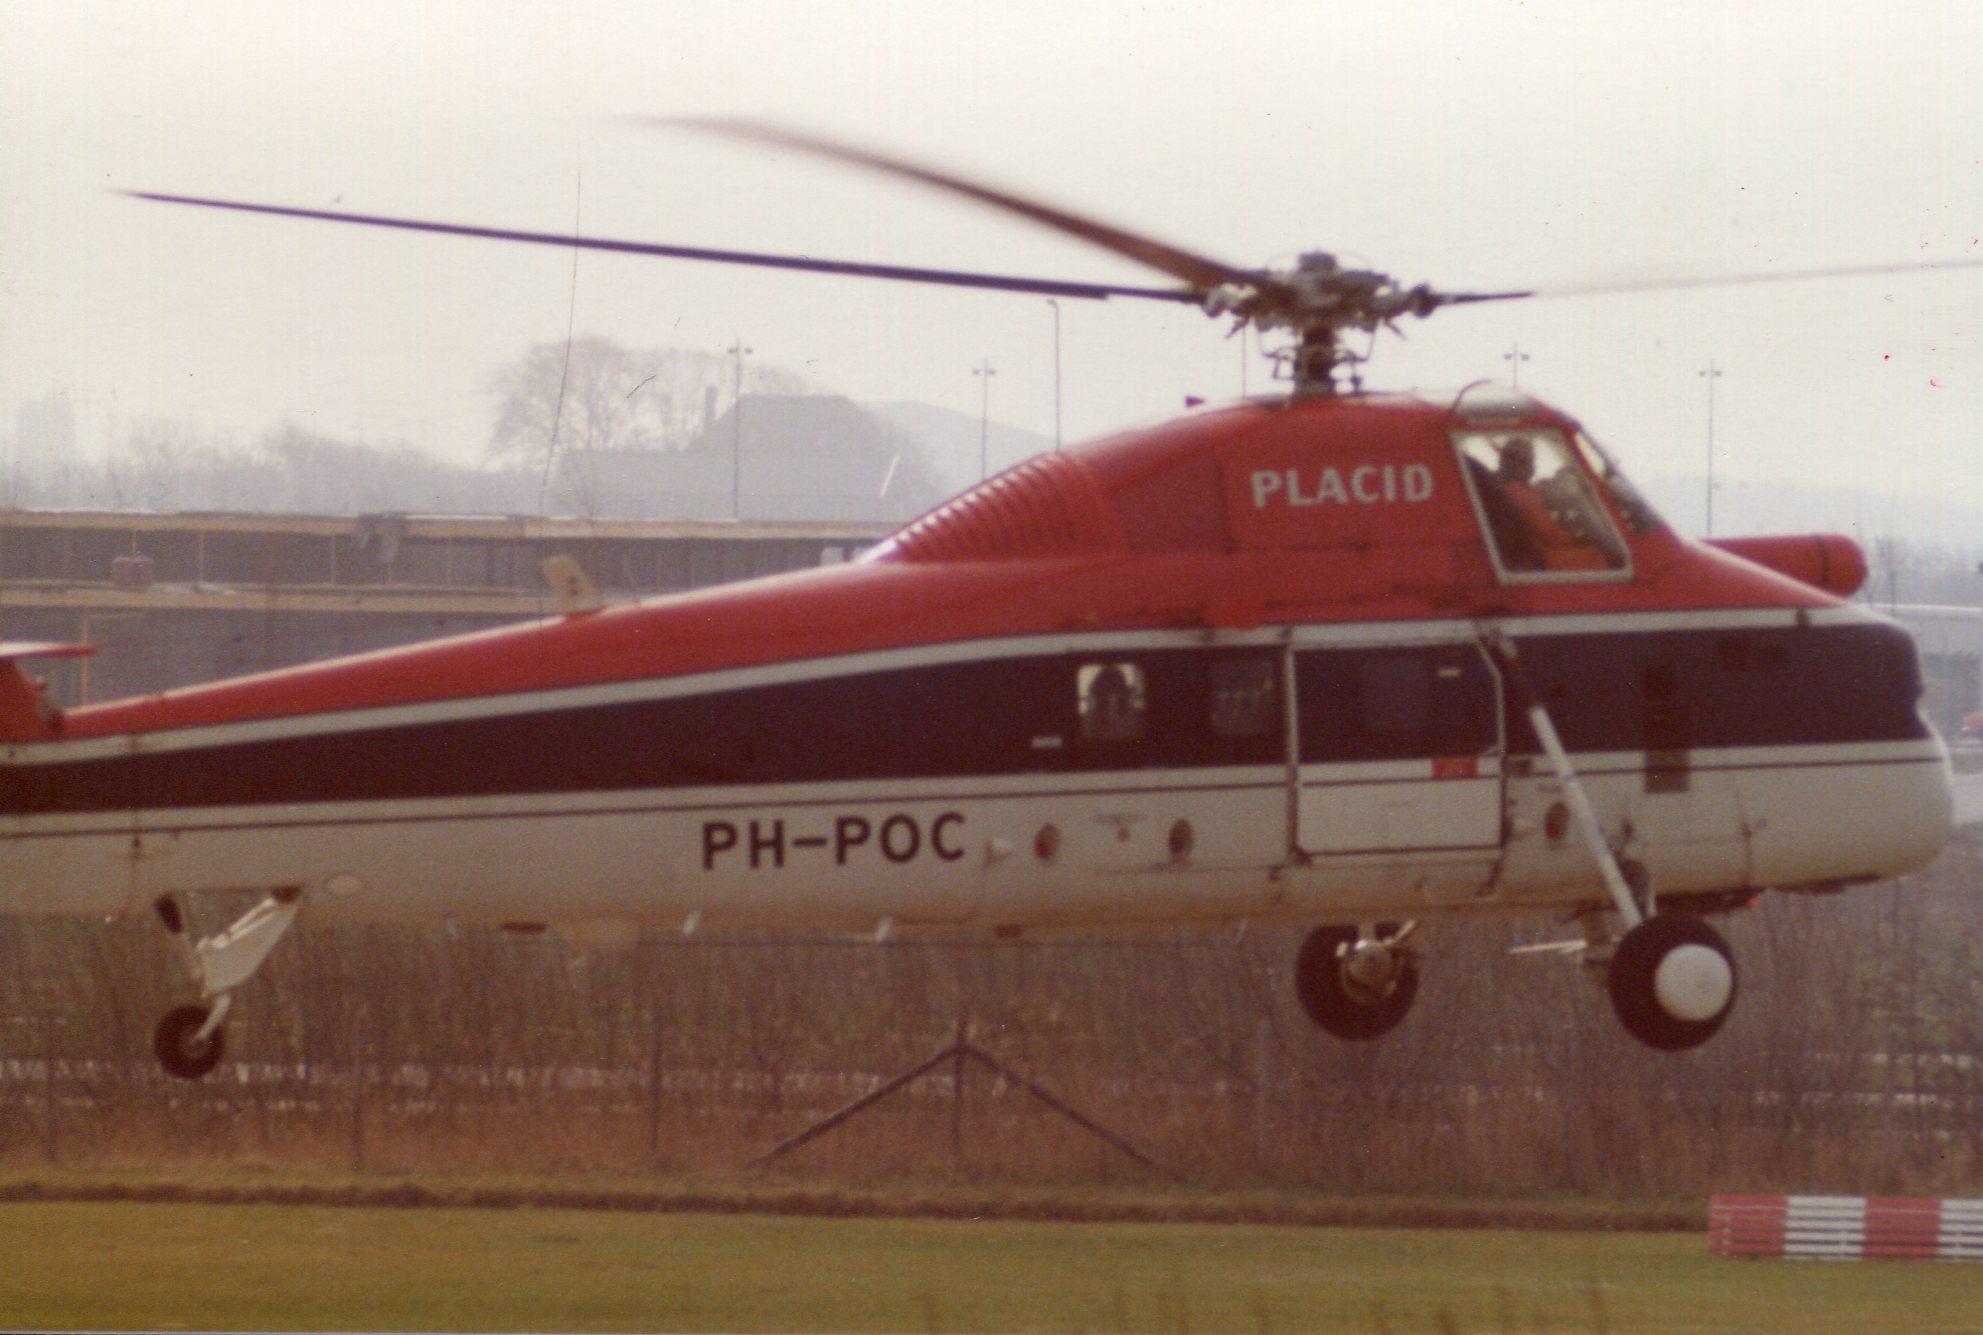 Naam: Den Helder , april 1977.jpg Bekeken: 587 Grootte: 279,4 KB